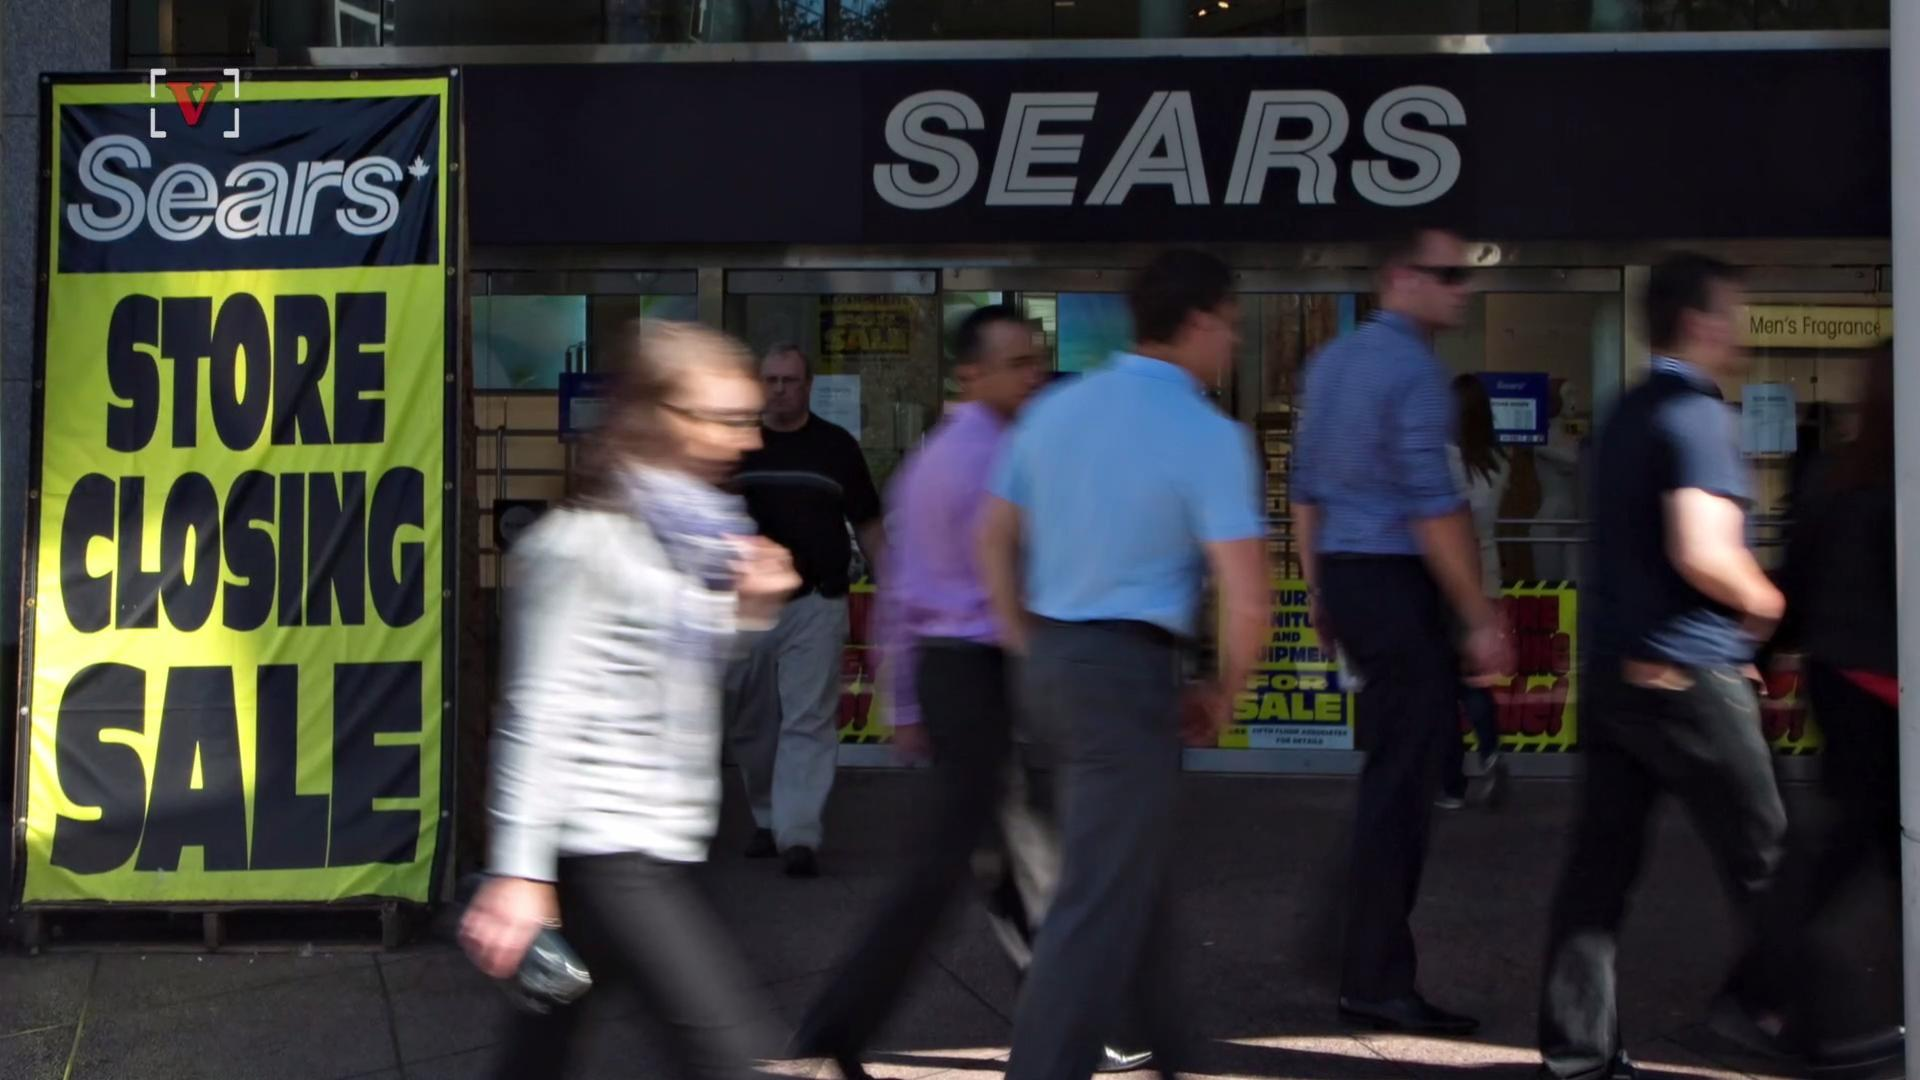 Sears' Financial Troubles Extend Beyond U.S.